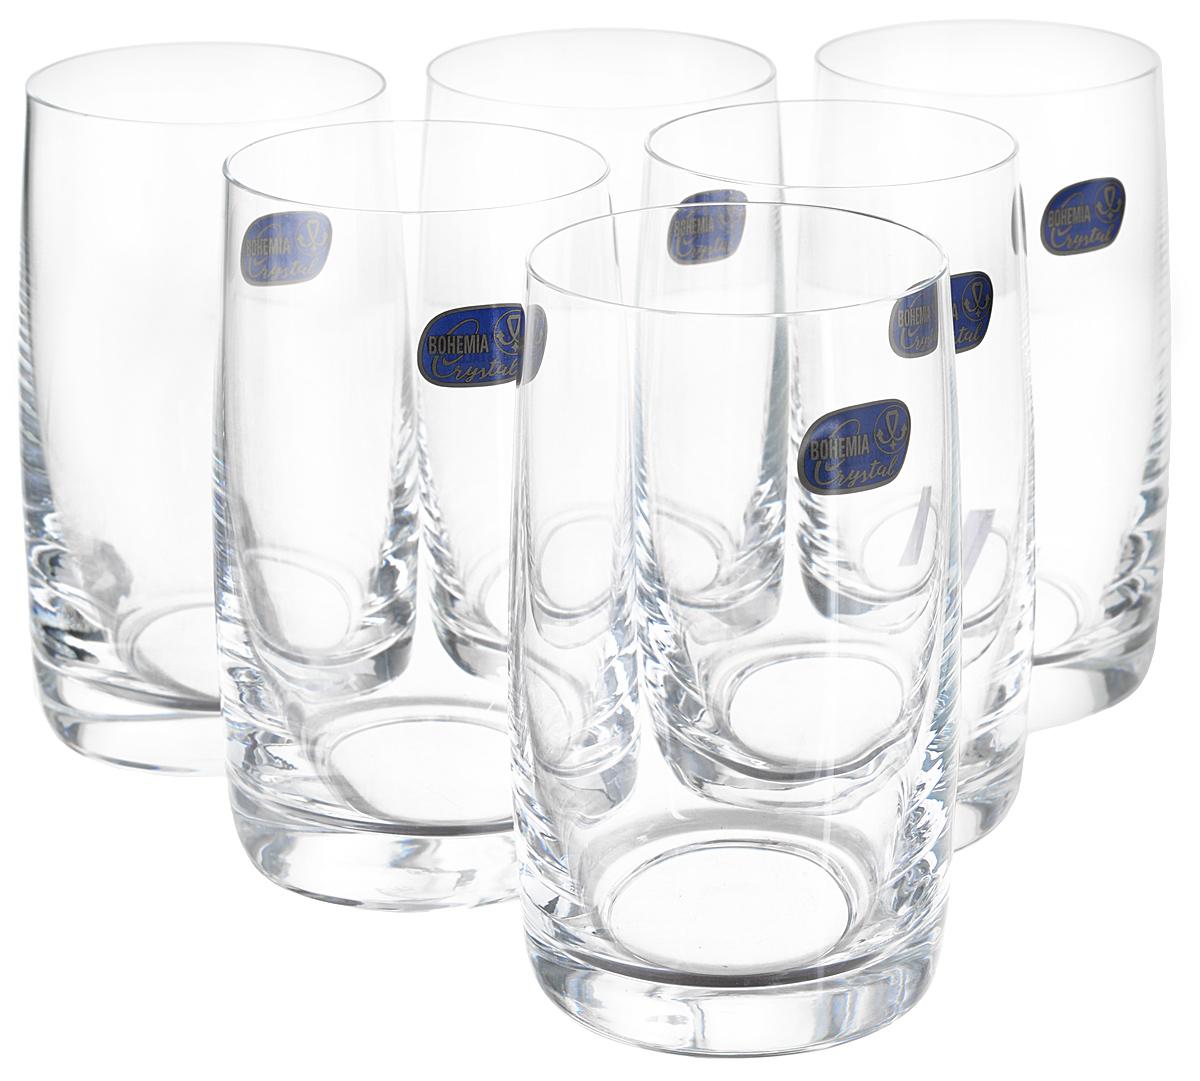 Набор стаканов для воды Bohemia Crystall Идеал, 250 мл, 6 шт арт нуво ваза bohemia crystall